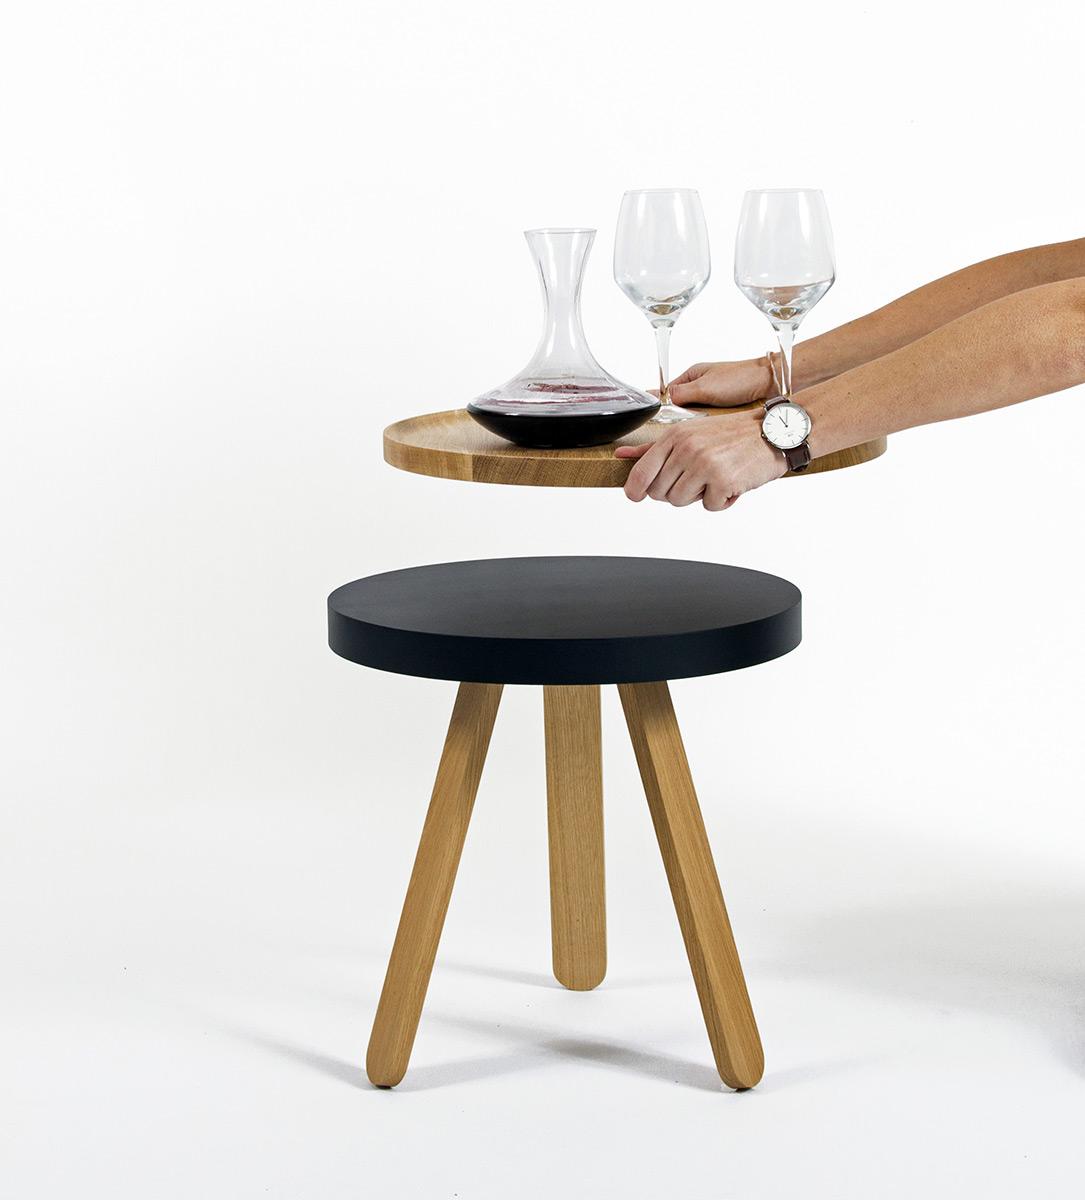 woodendot-small-batea-tray-table-10